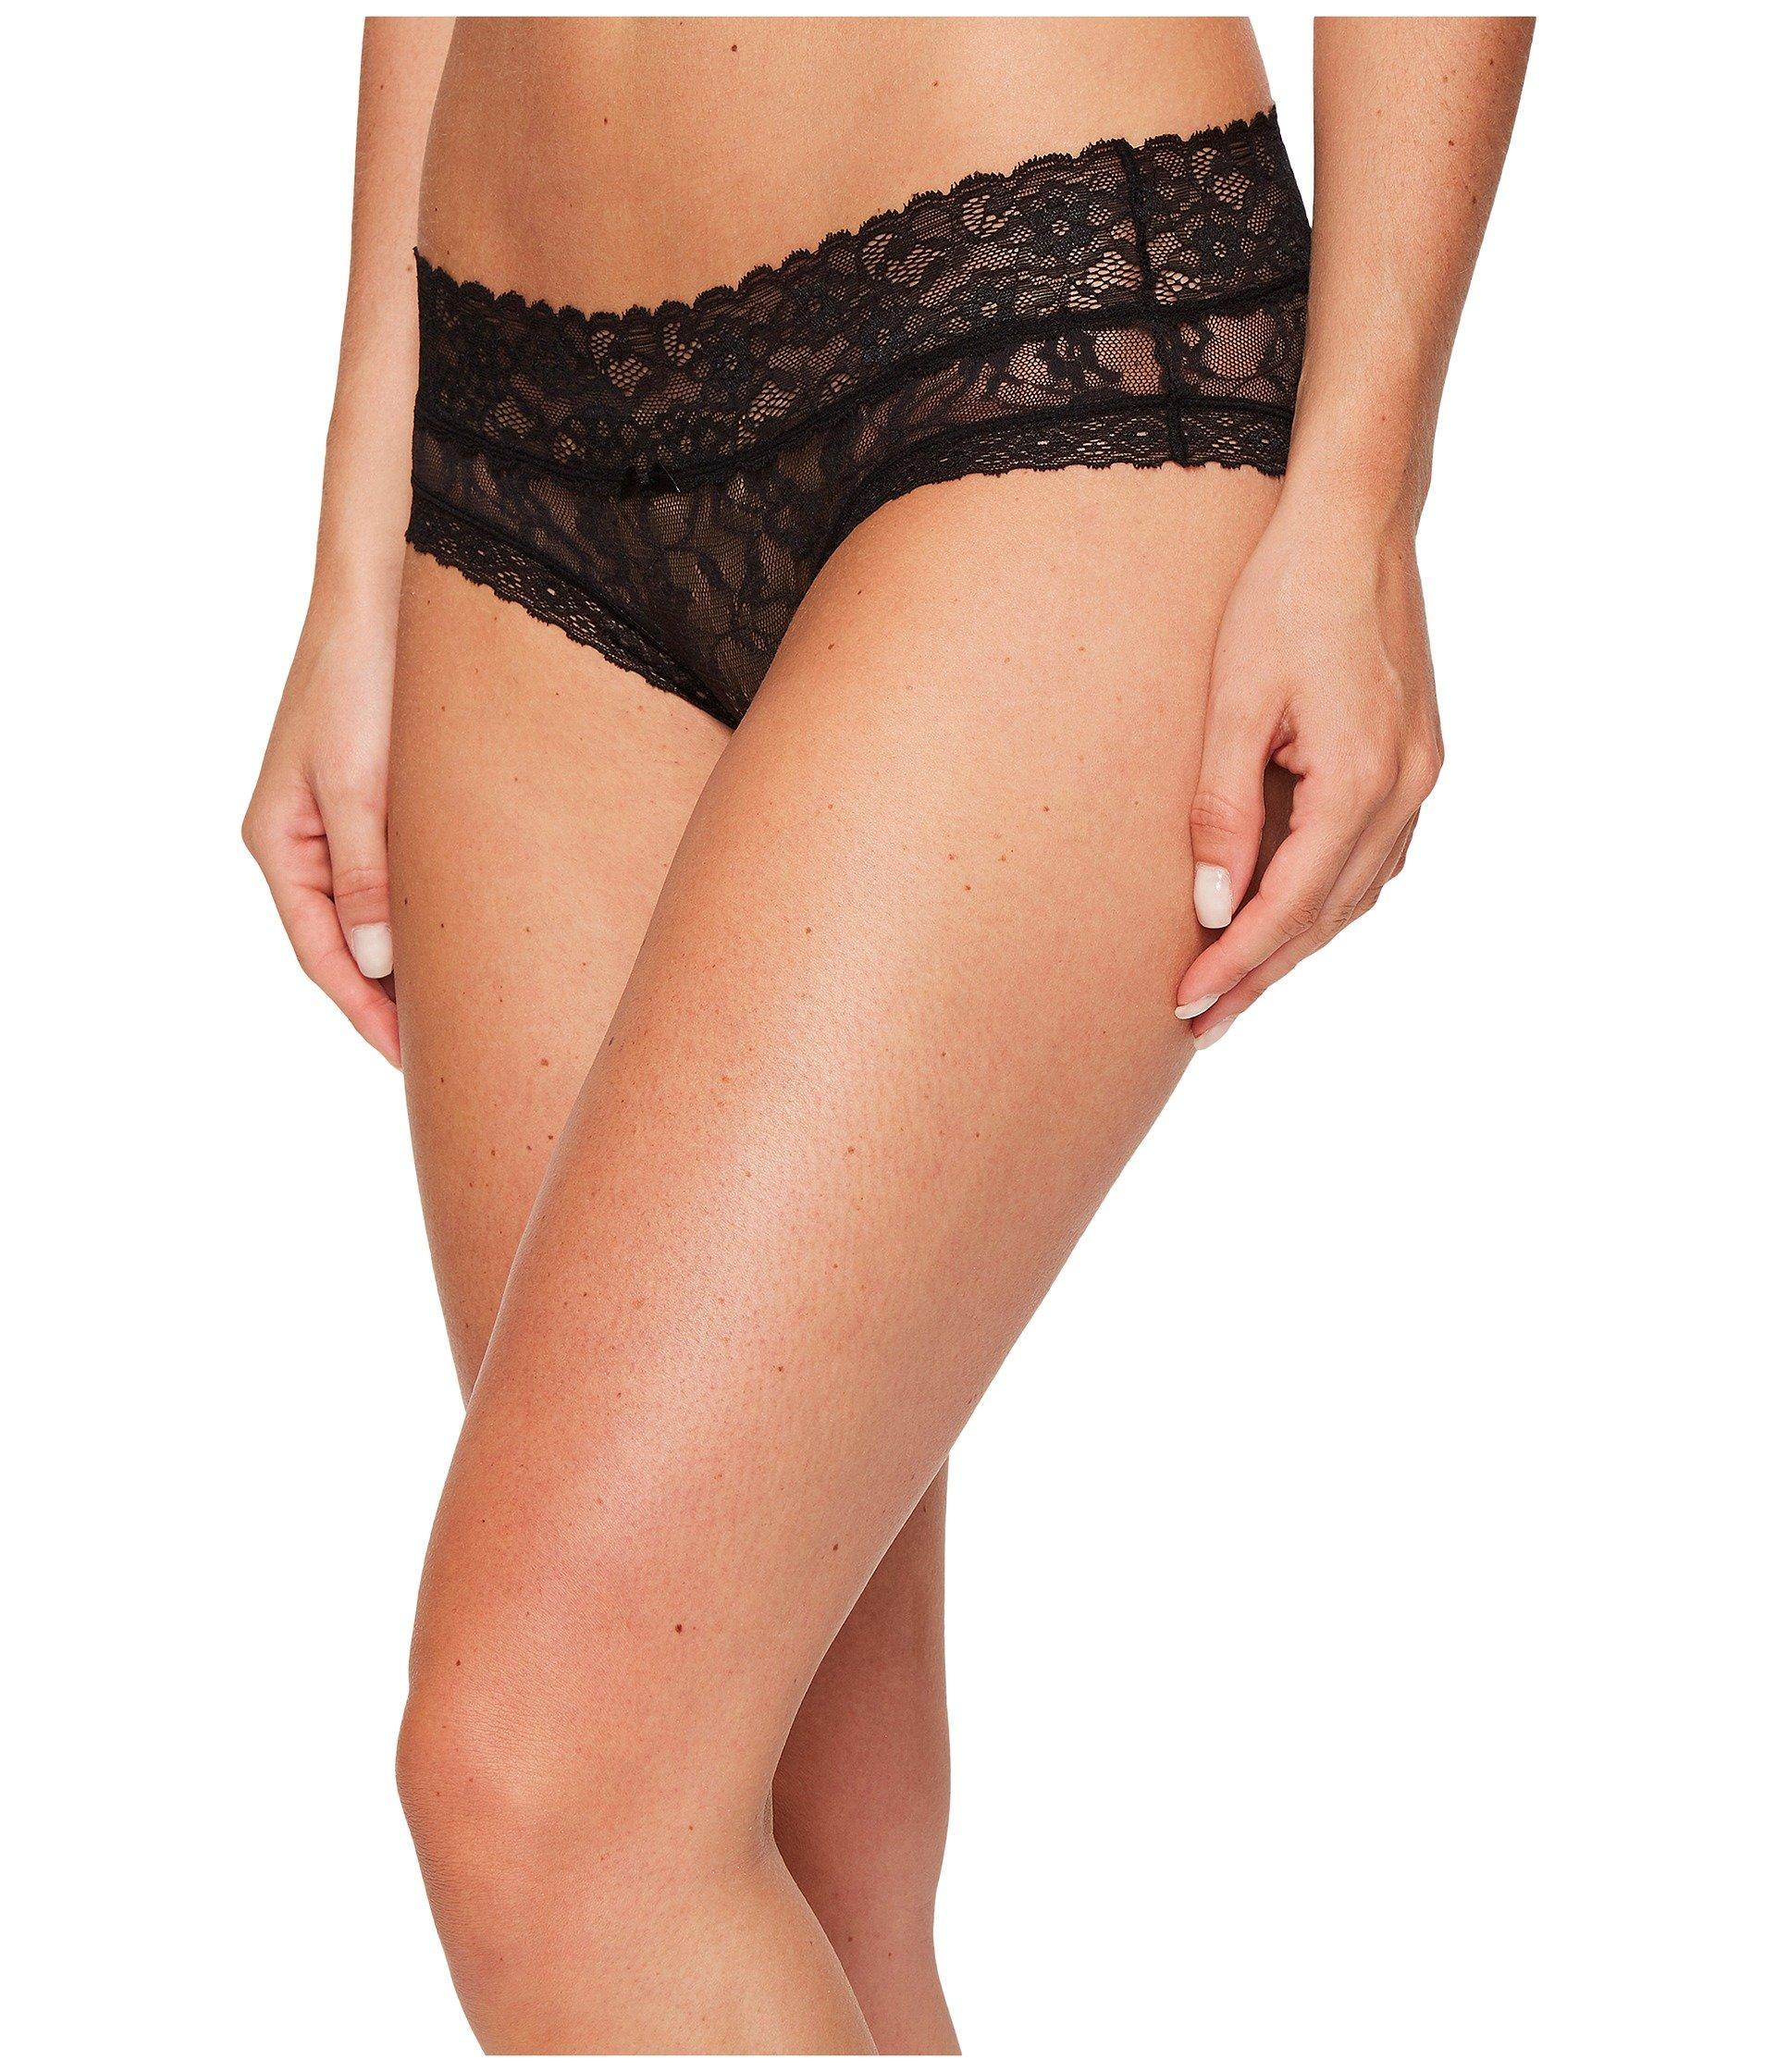 df27d5e55fce DKNY Signature Lace Bikini 543000 (black) Women's Underwear in Black ...